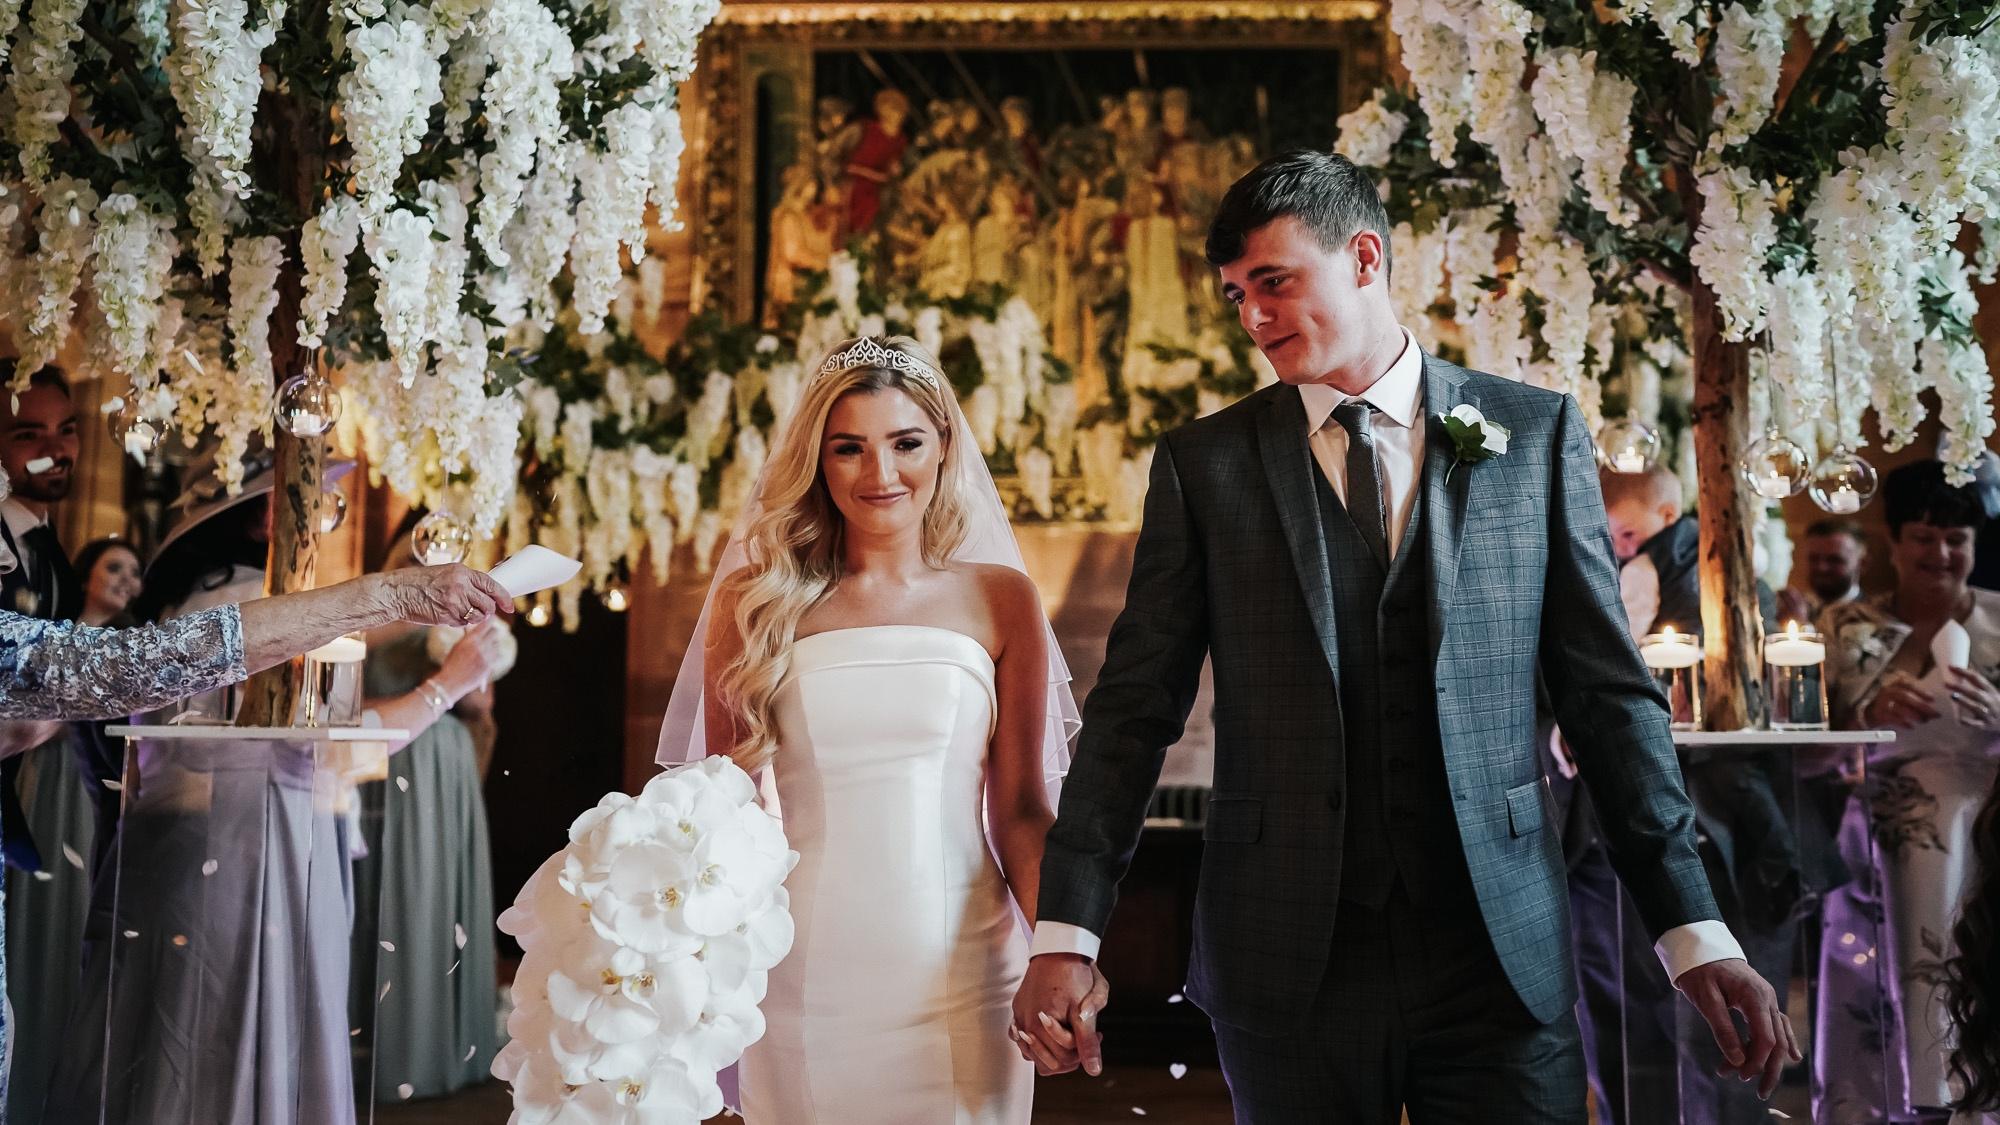 Peckforton+Castle+wedding+photography+cheshire+wedding+photographer+%2824+of+57%29.jpg